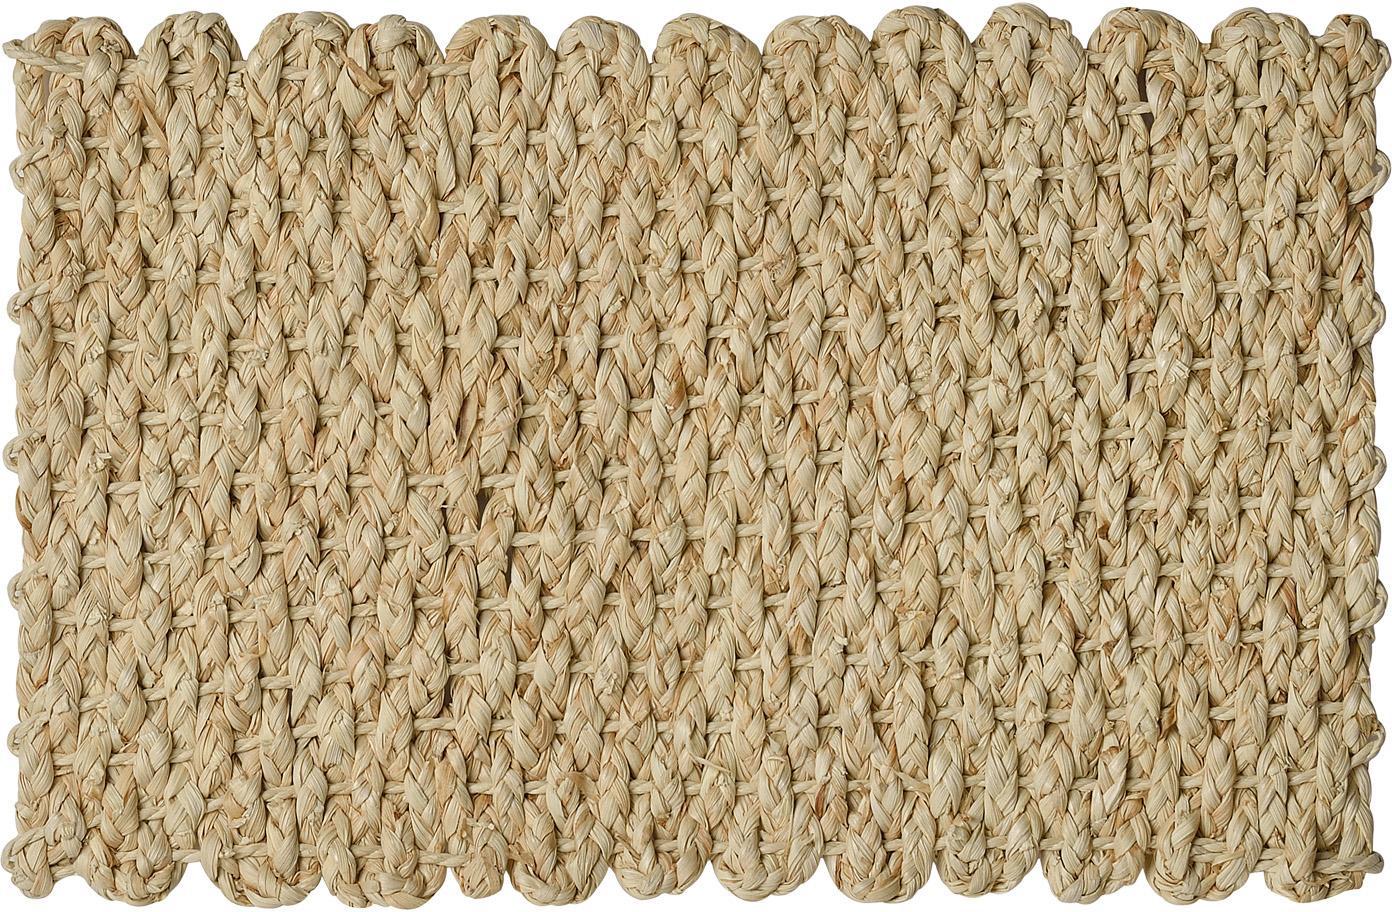 Tovaglietta americana Cascada 2 pz, Paglia di mais, Paglia di mais, Larg. 30 x Lung. 45 cm